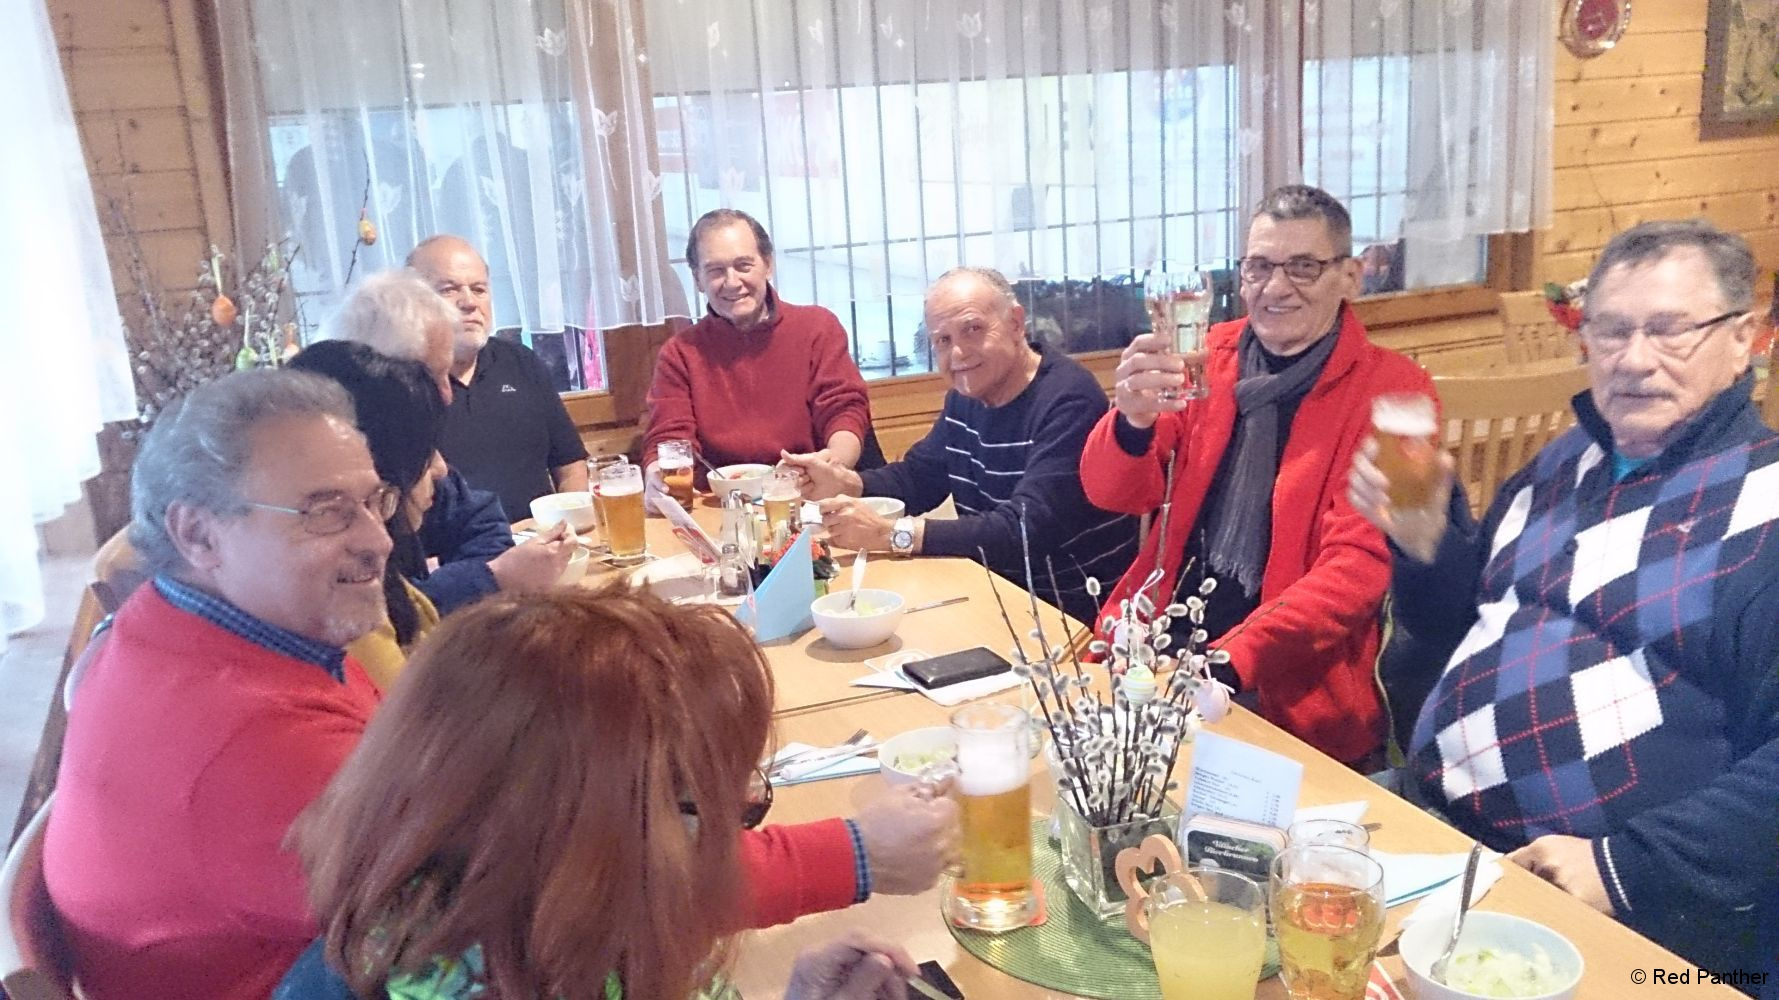 Red-Panther-Eisstockschießen-Abschluß-2016-007.jpg